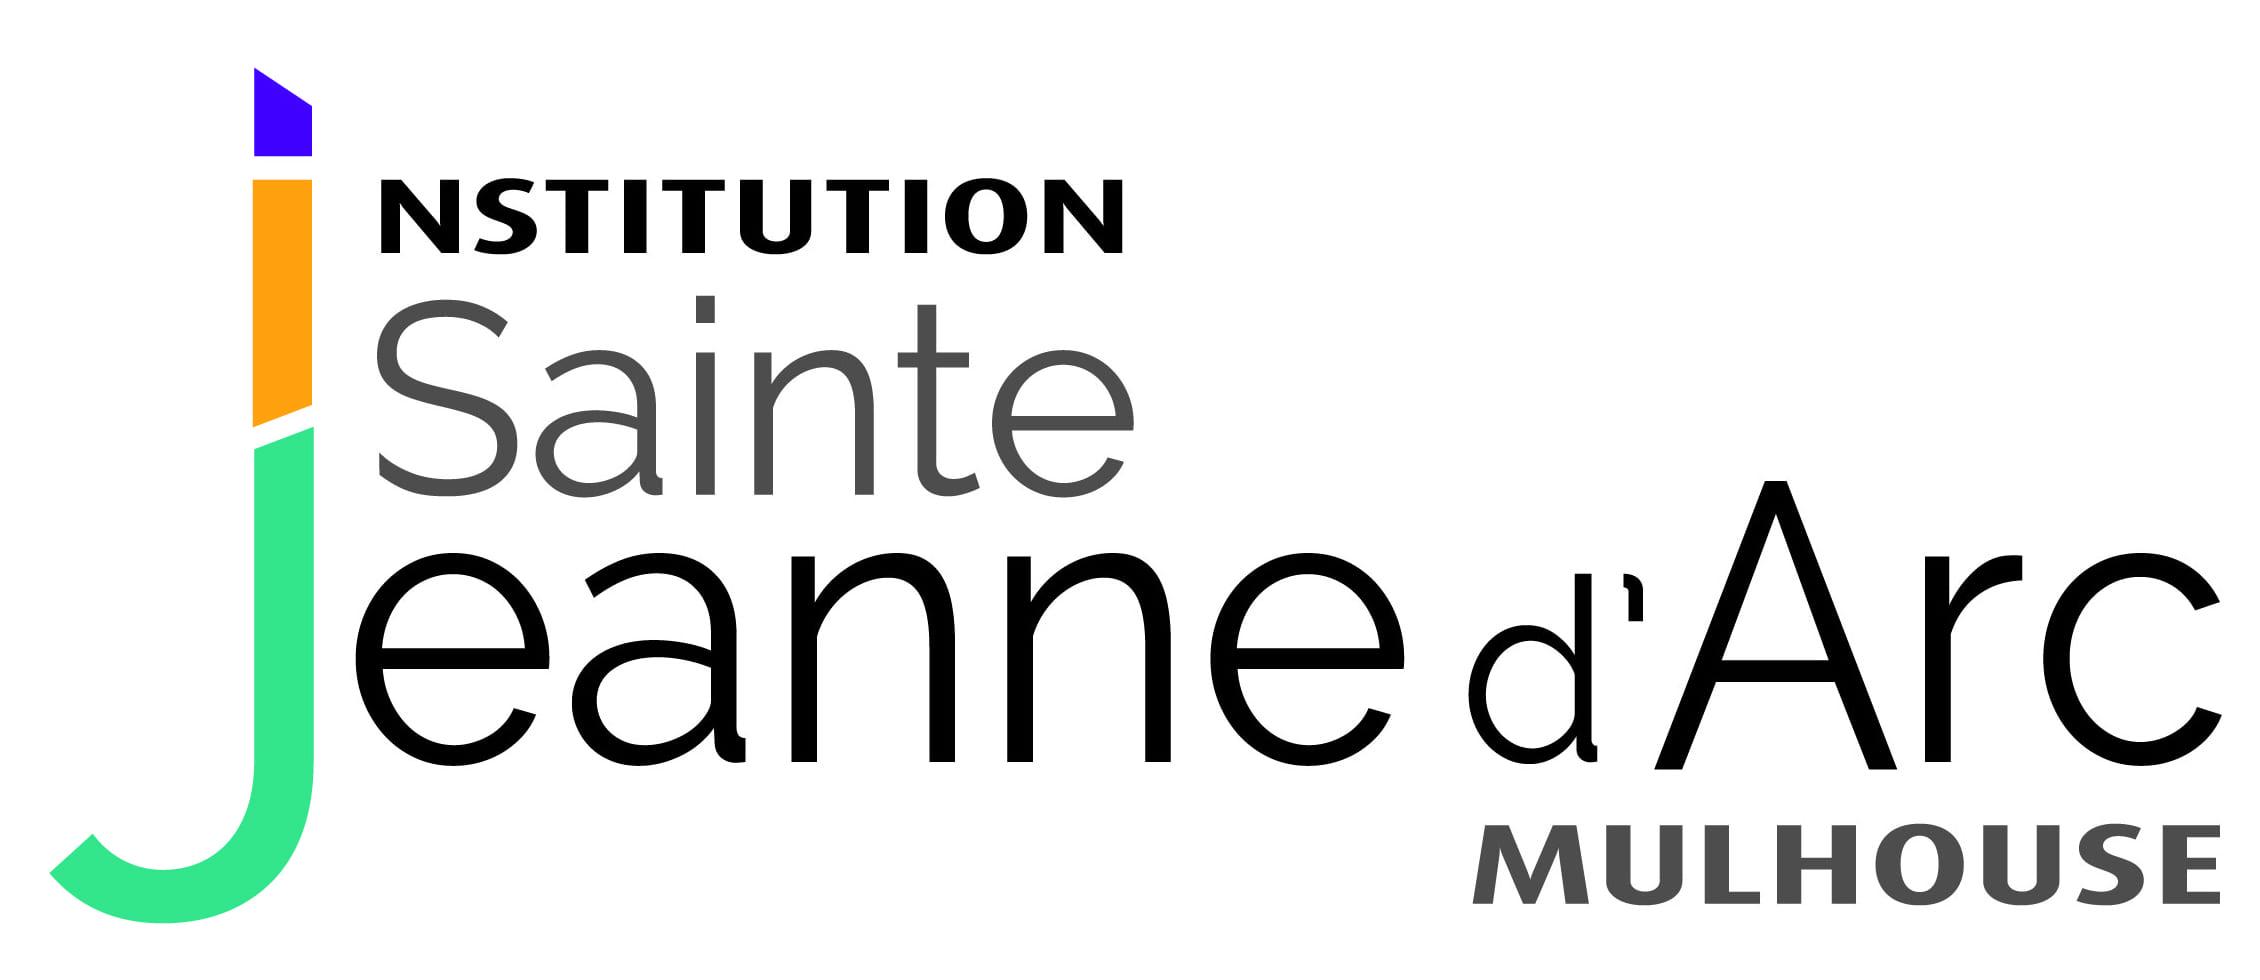 Institution-sainte-jeanne-d-arc-Mulhouse-new